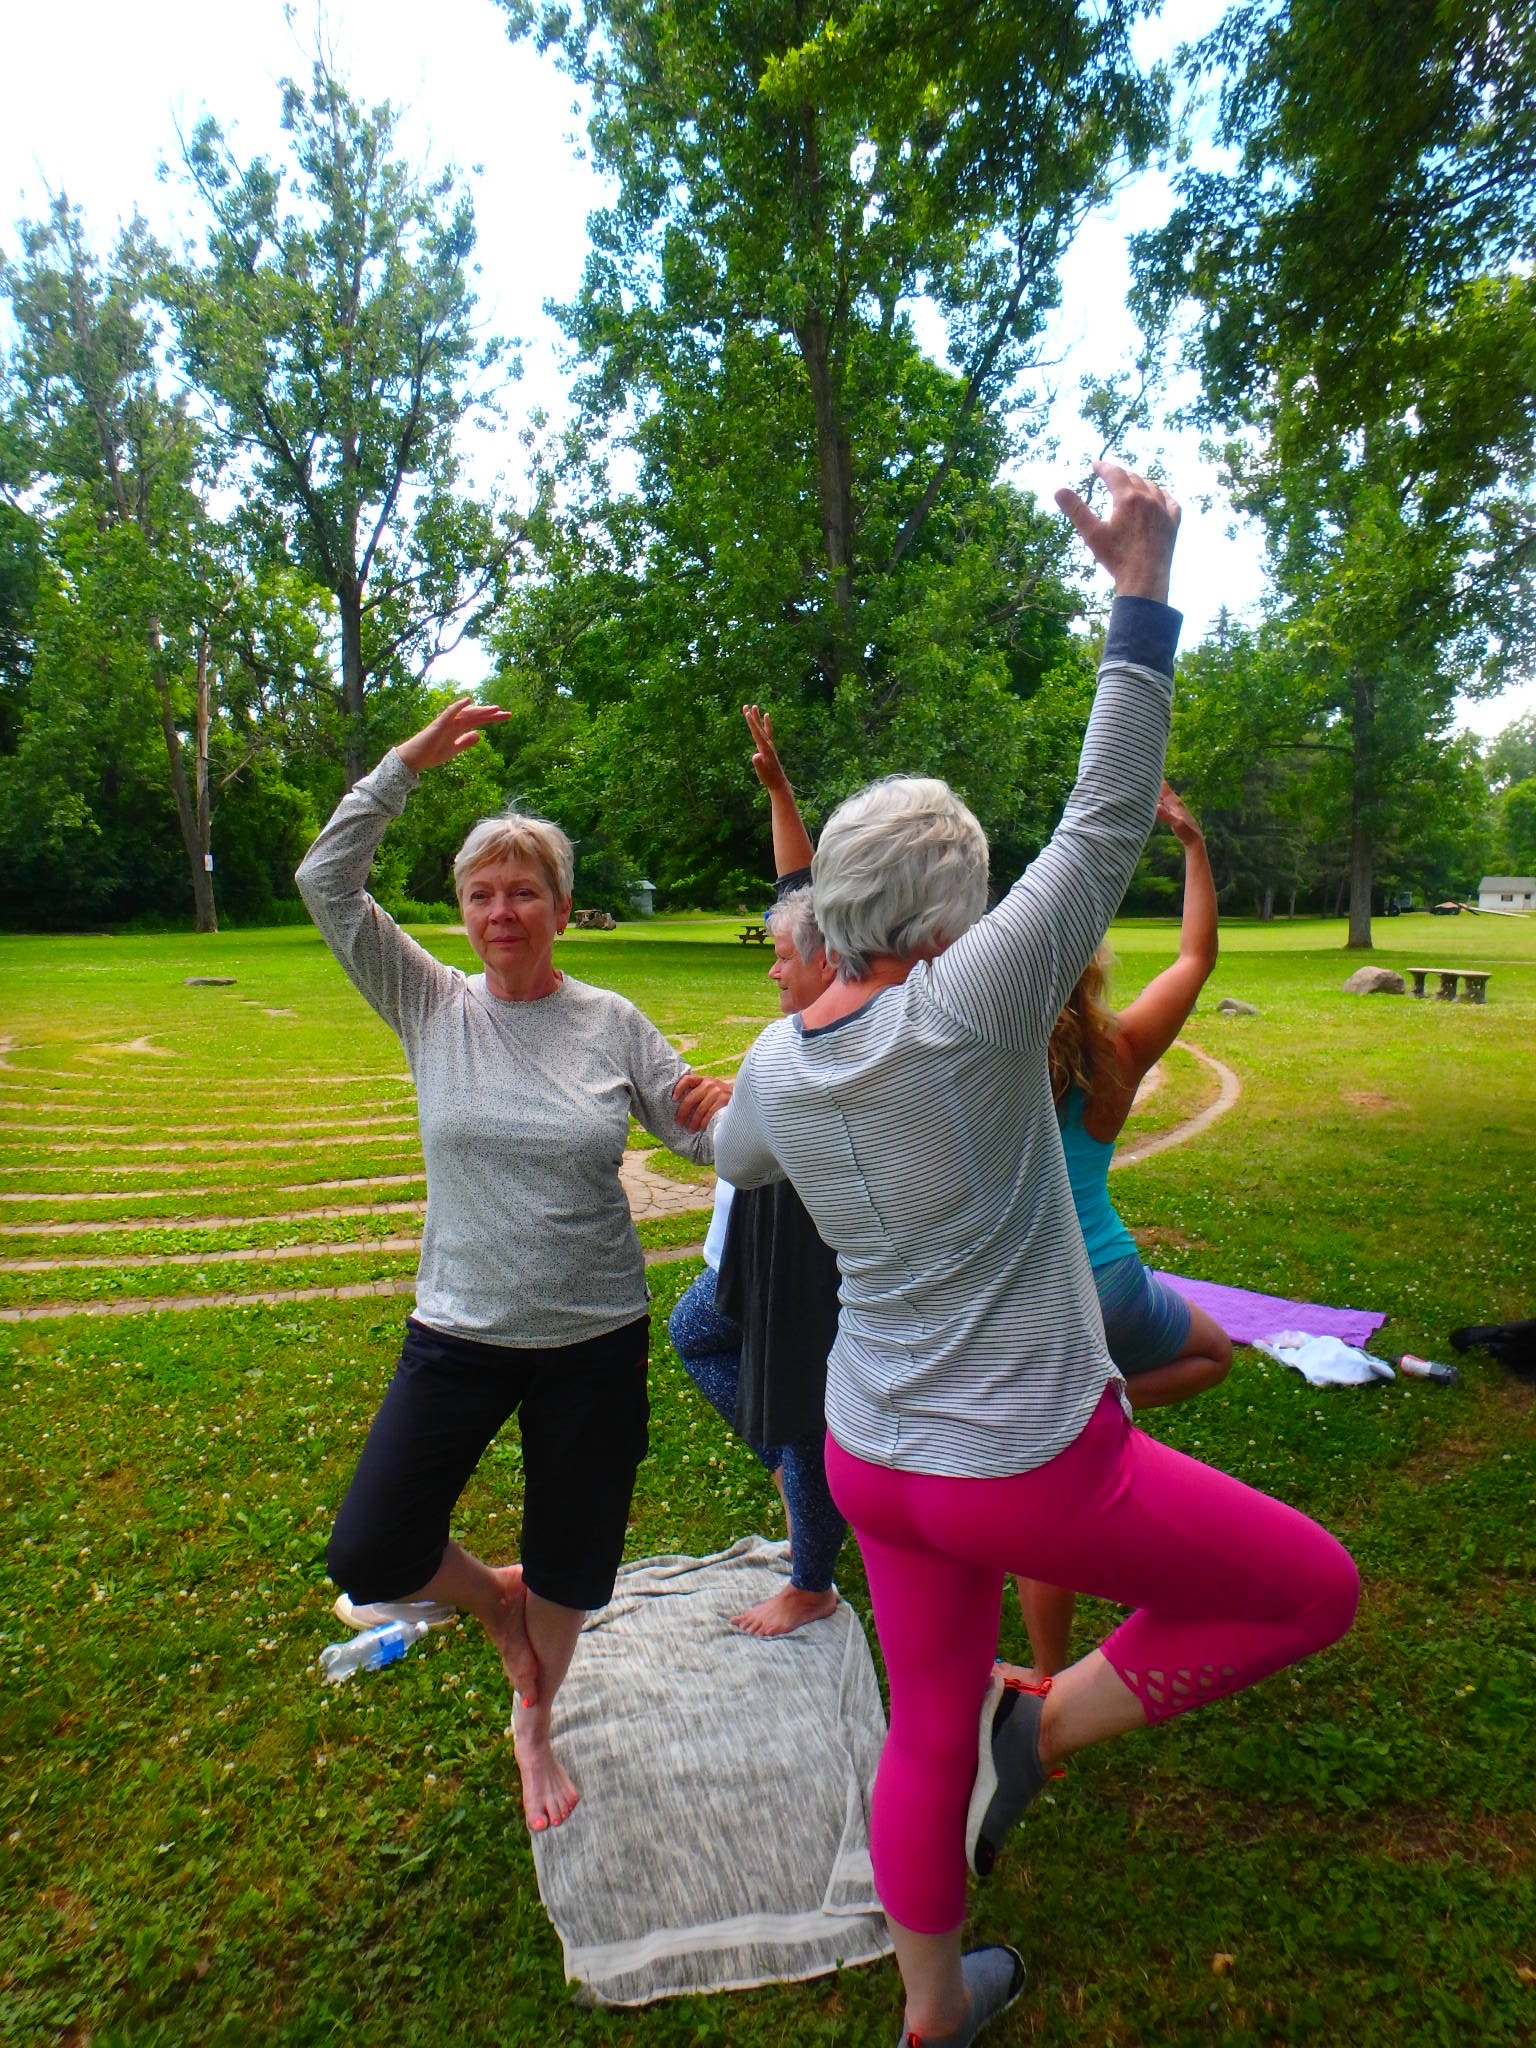 Kayaking Yoga Meditation - Solstice - Jun 21 2018-59